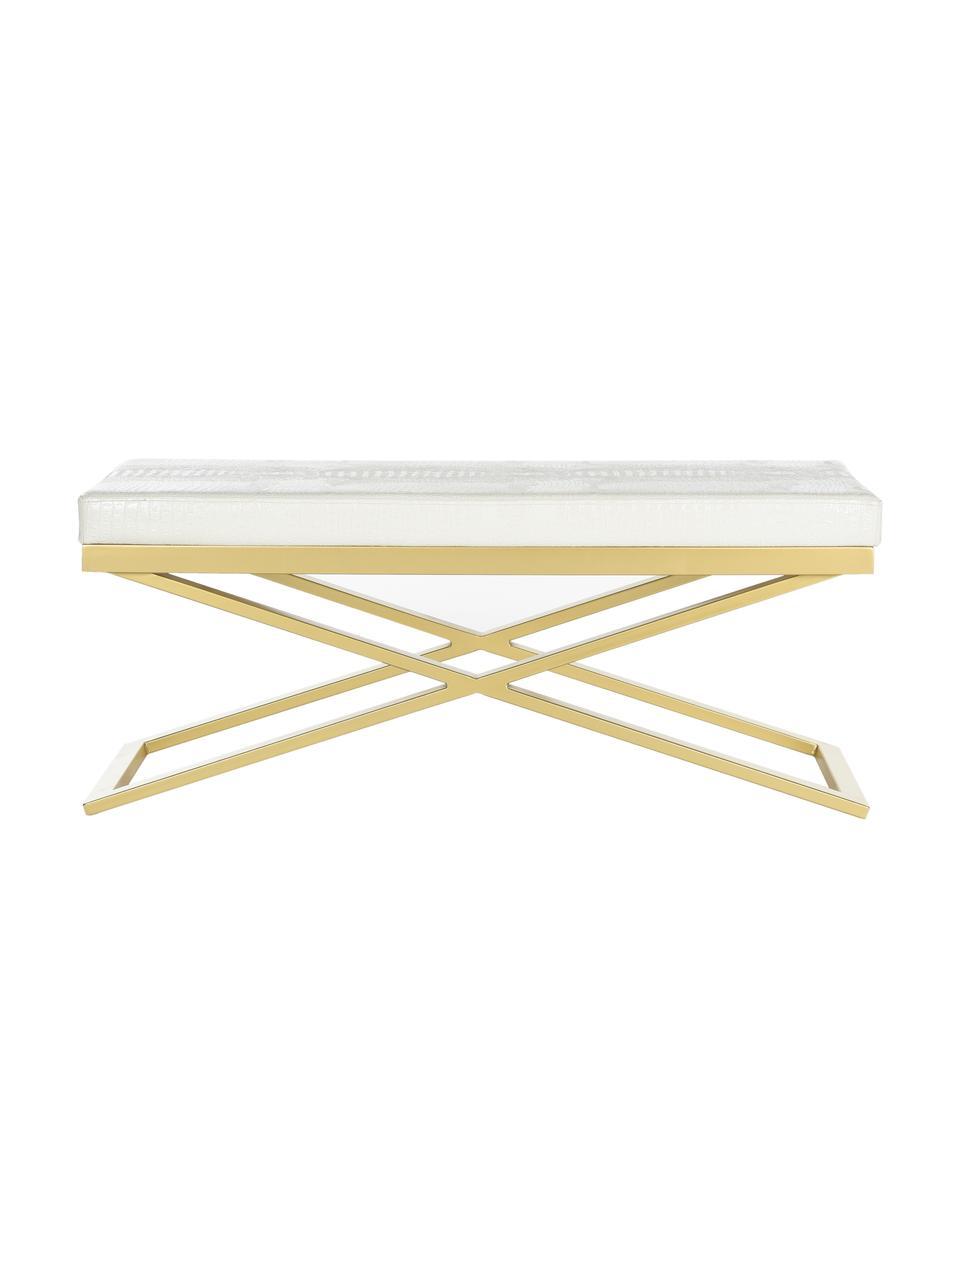 Kunstleder-Sitzbank Susan, Gestell: Stahl, lackiert, Bezug: Kunstleder (Polyurethan) , Weiß, Goldfarben, 109 x 46 cm